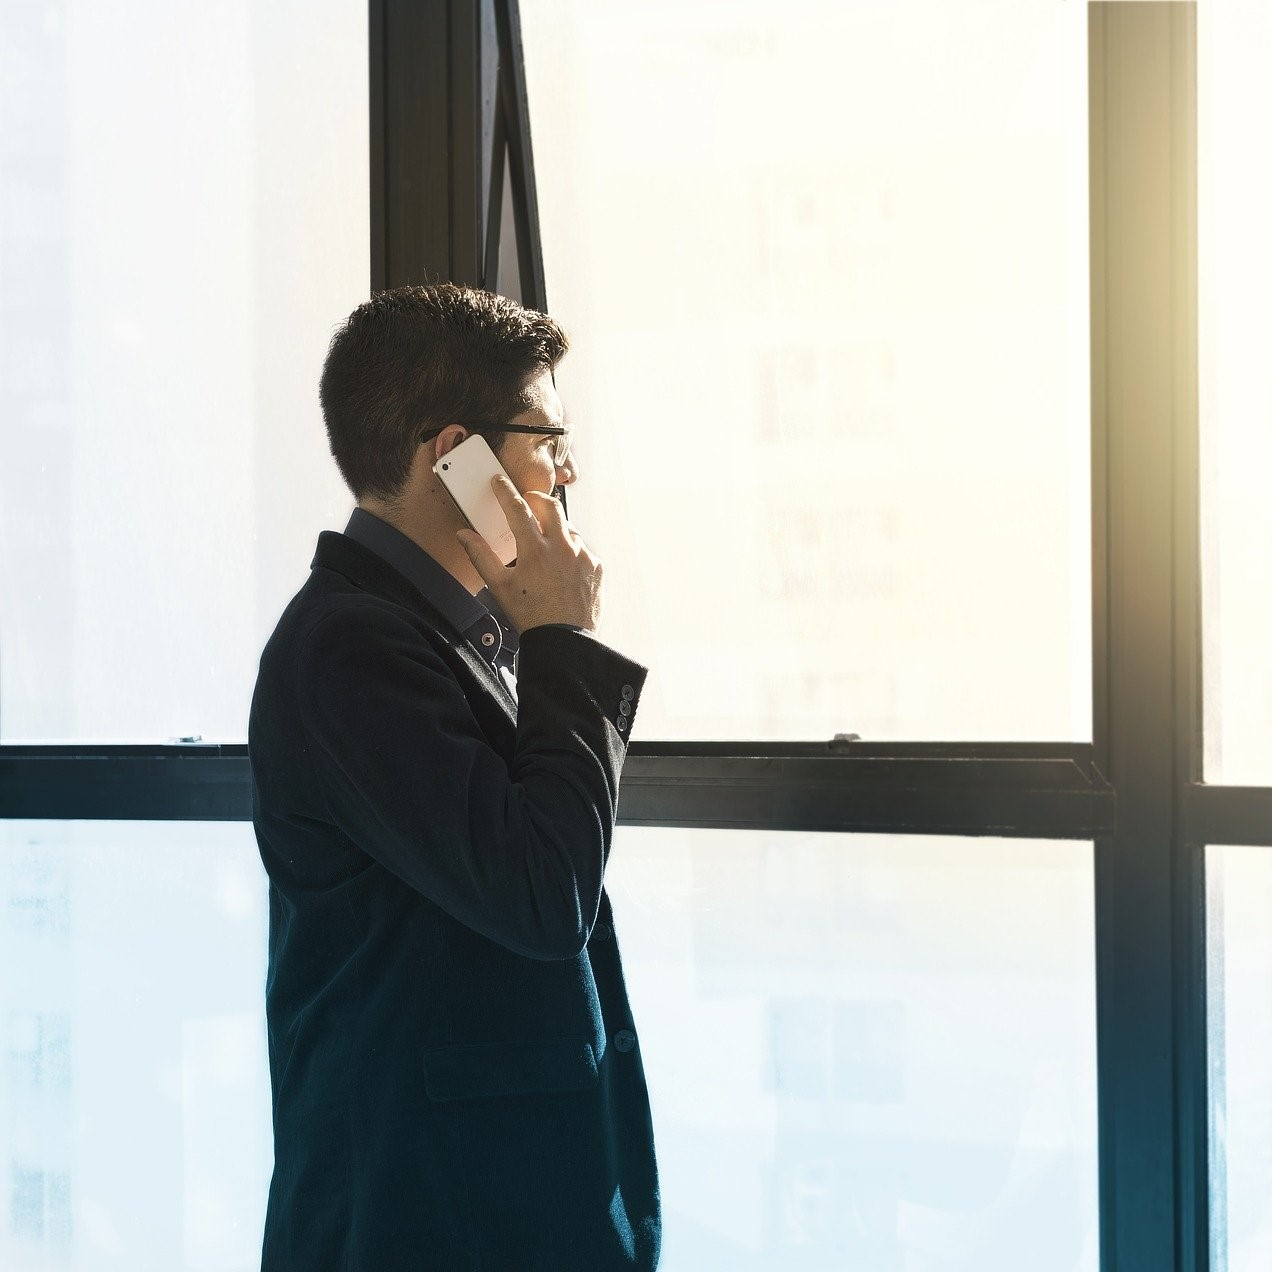 Self-confidence vs resilience: What makes entrepreneurs thrive?